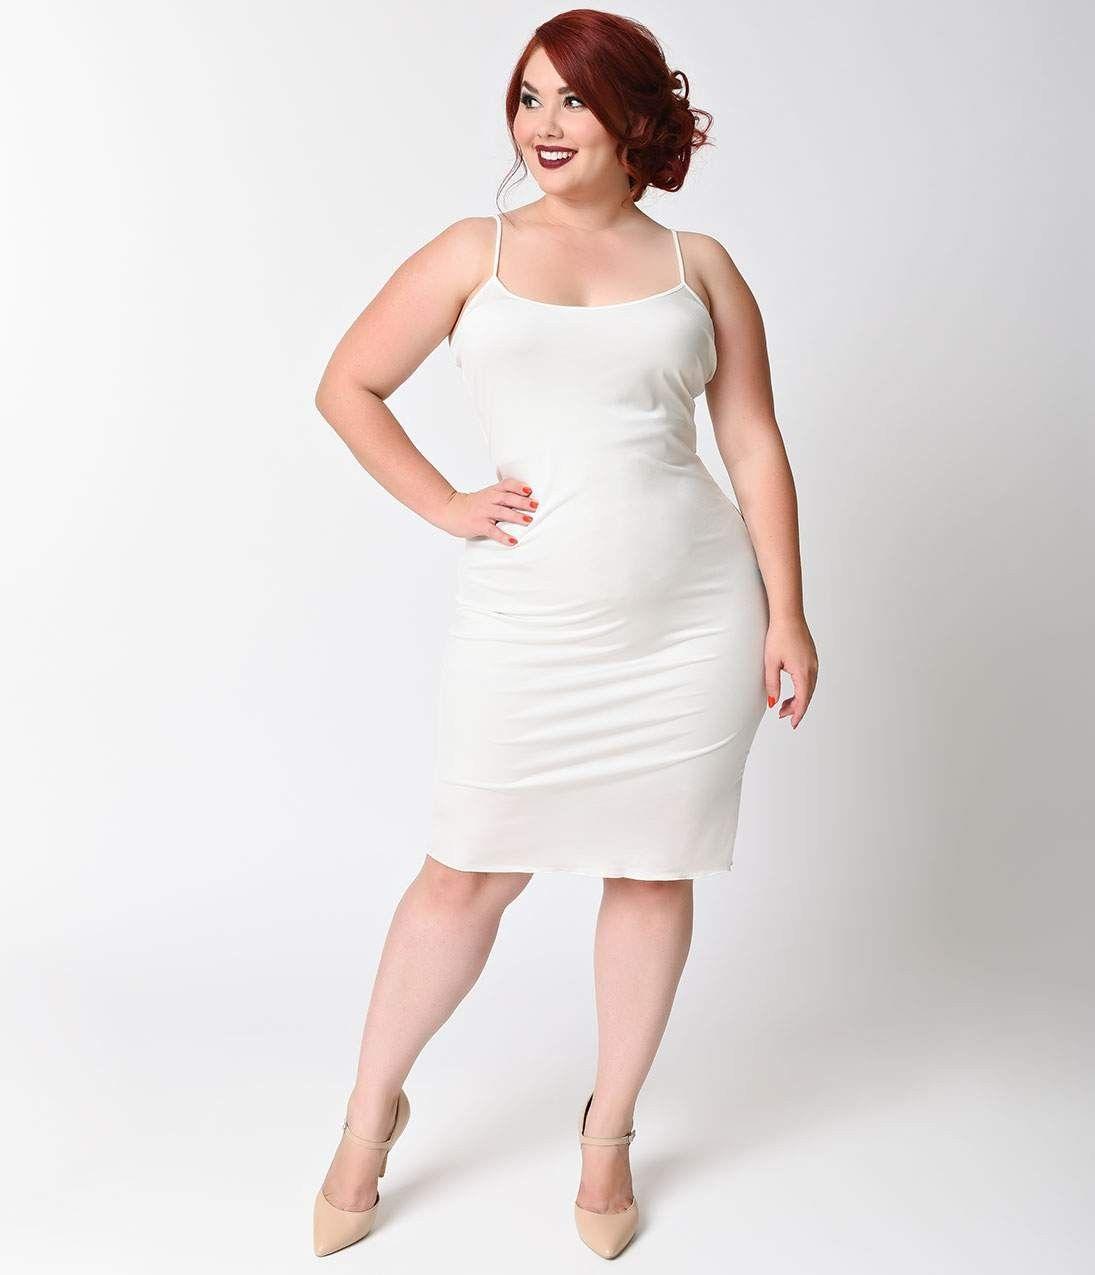 Gigi Marie | Redheads: Curvy & Plus-Size | Dresses, Plus size shorts ...